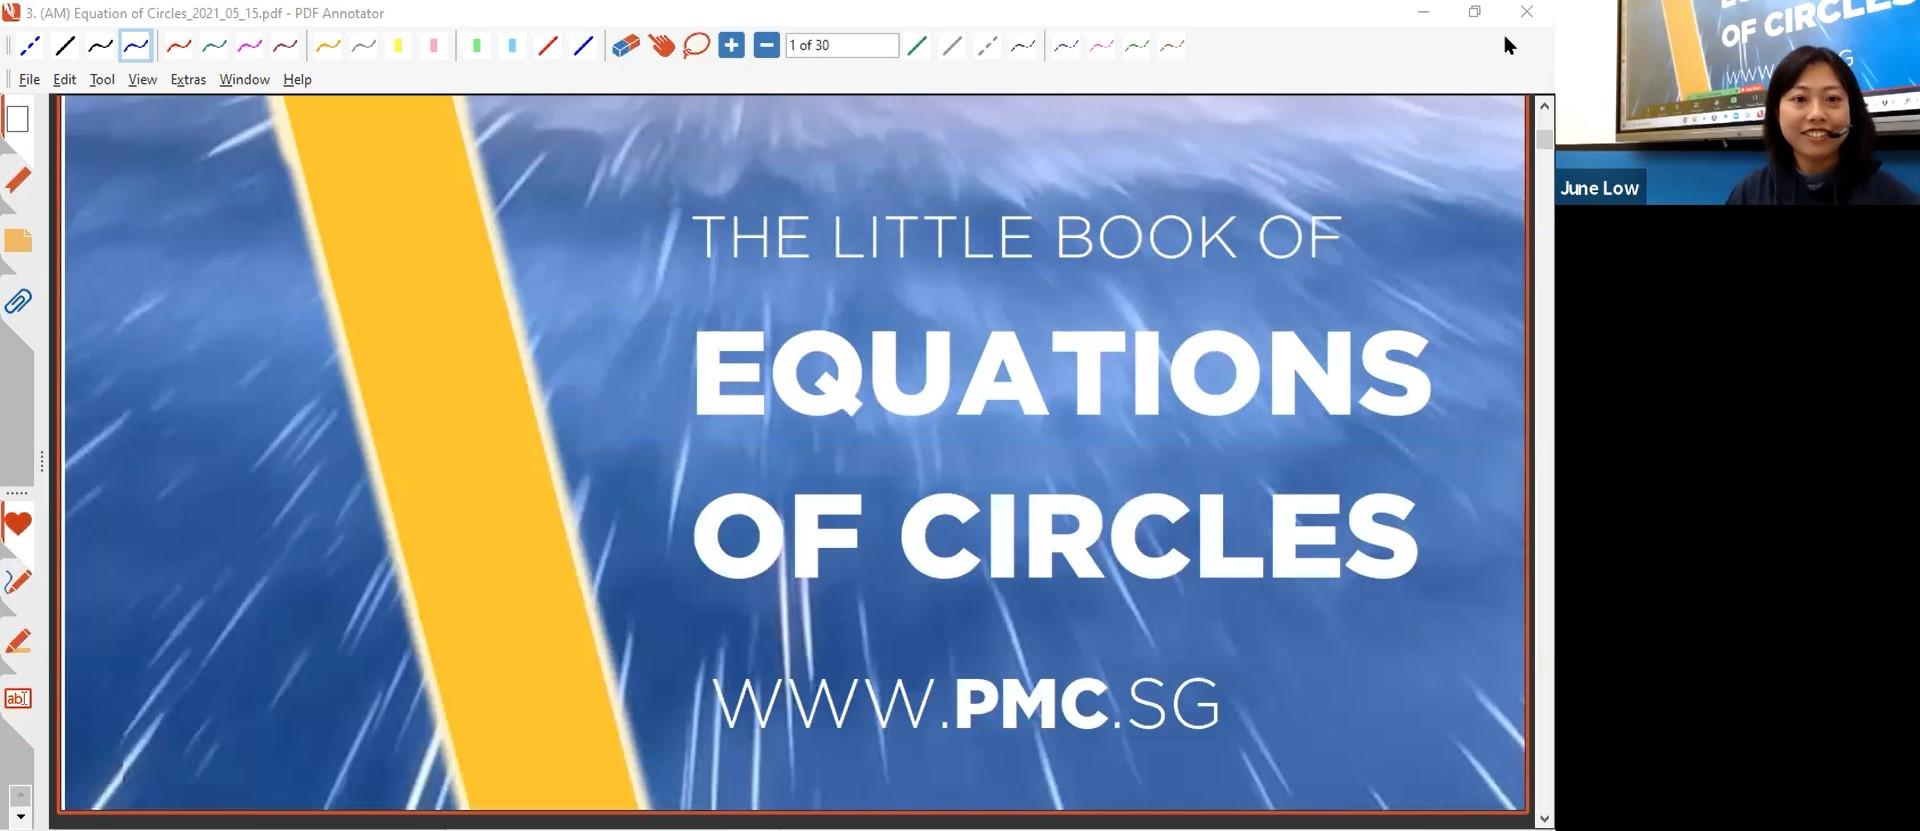 22. (AM) Equation of Circles